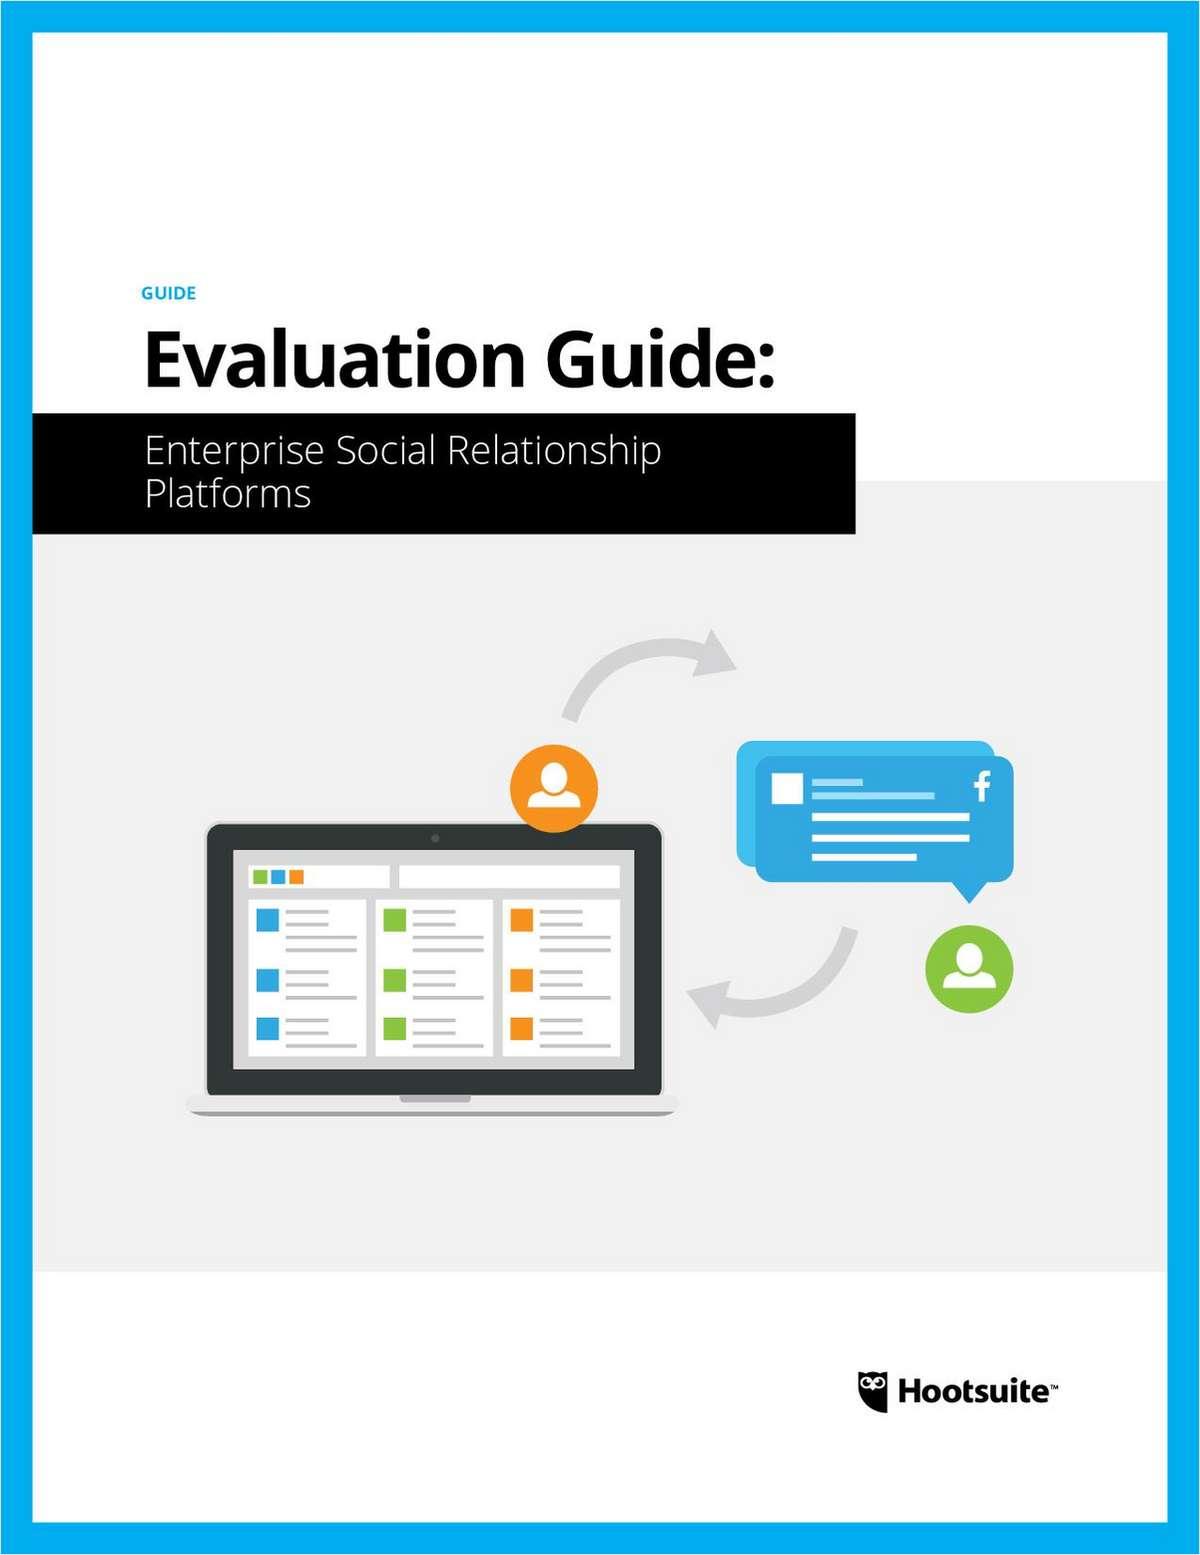 A Guide to Evaluating Enterprise Social Relationship Platforms